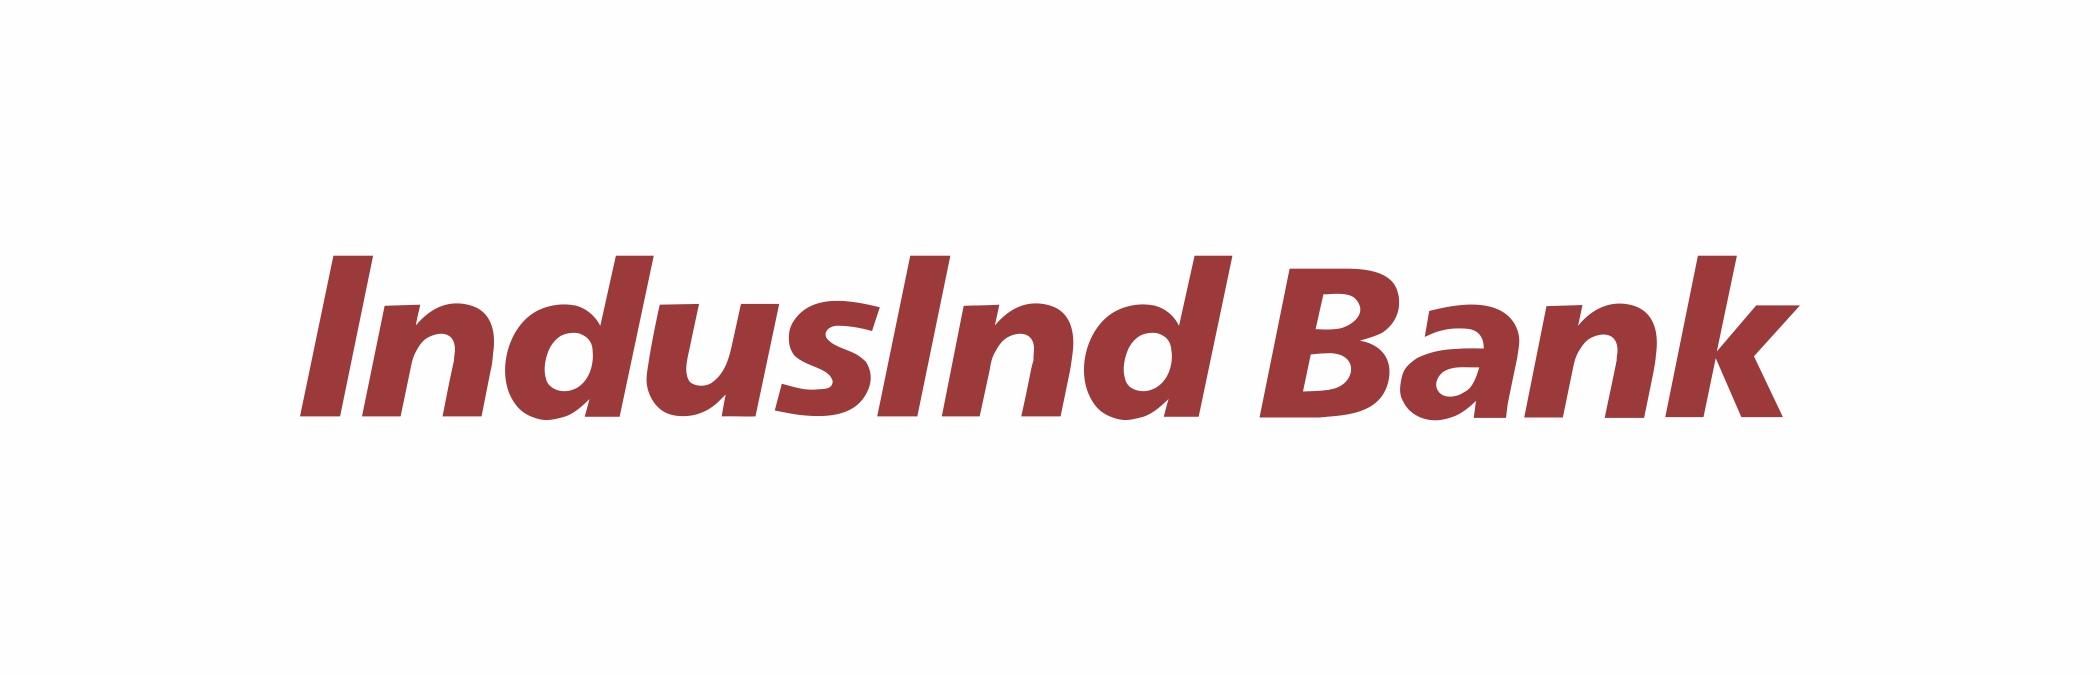 Check IndusInd Bank IFSC and MICR Codes Here @ Rupeenomics.com